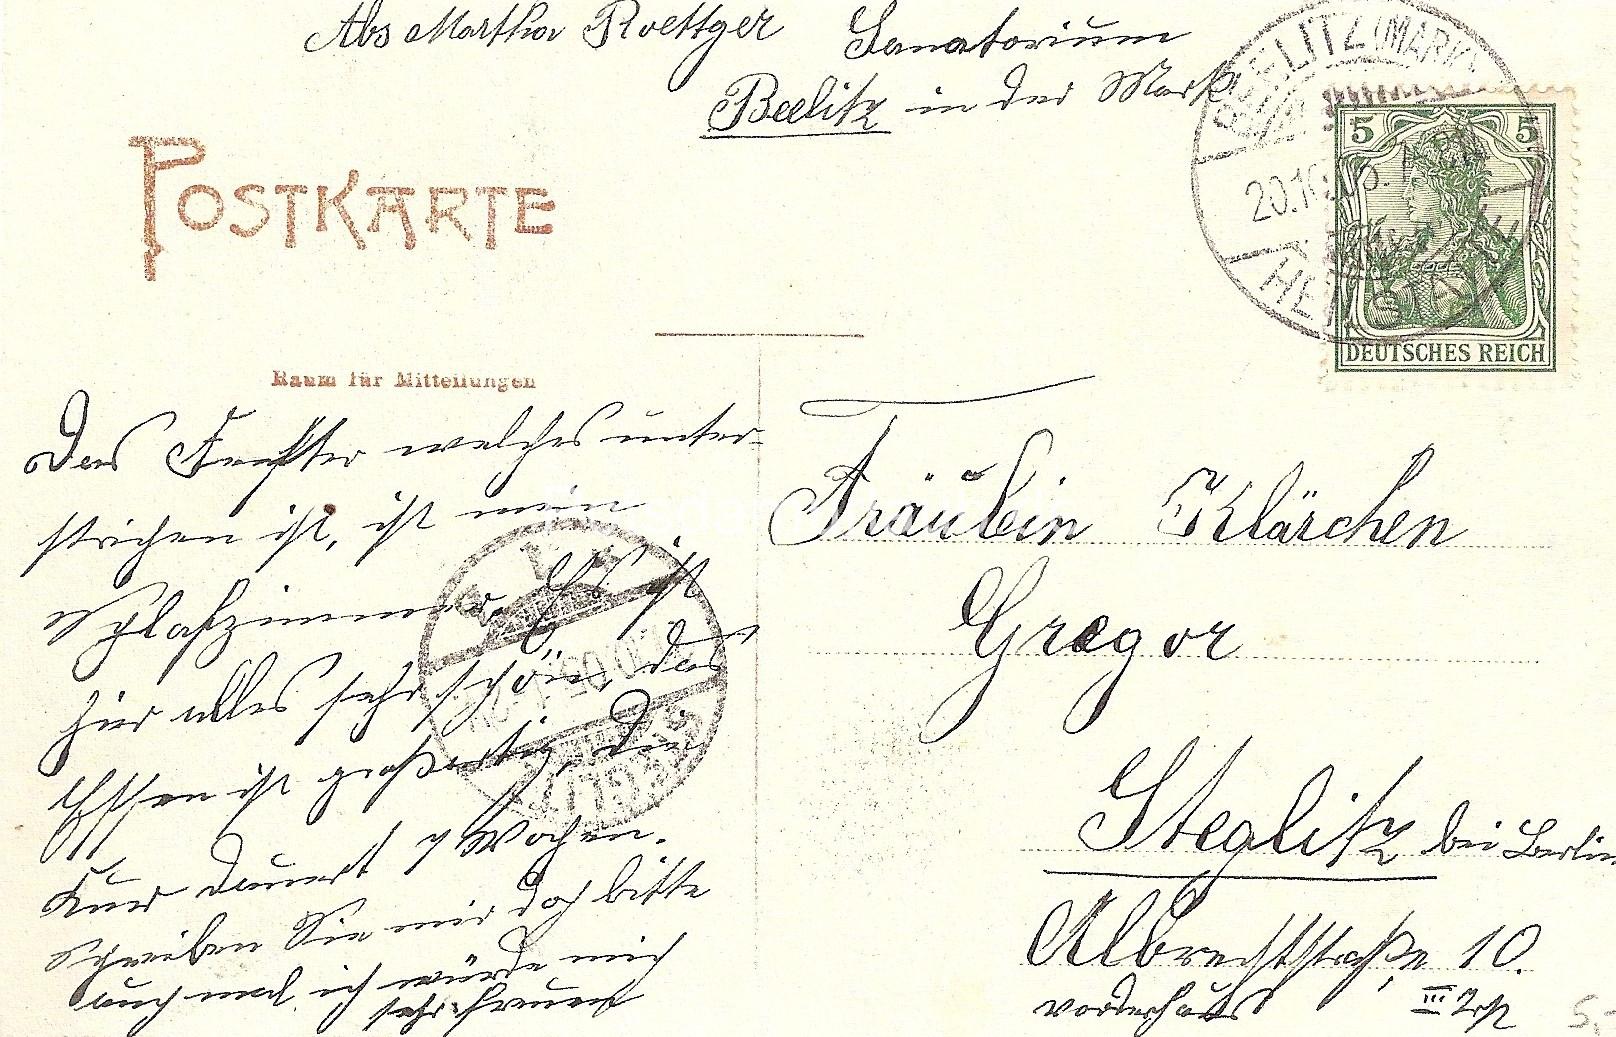 1905 10 20